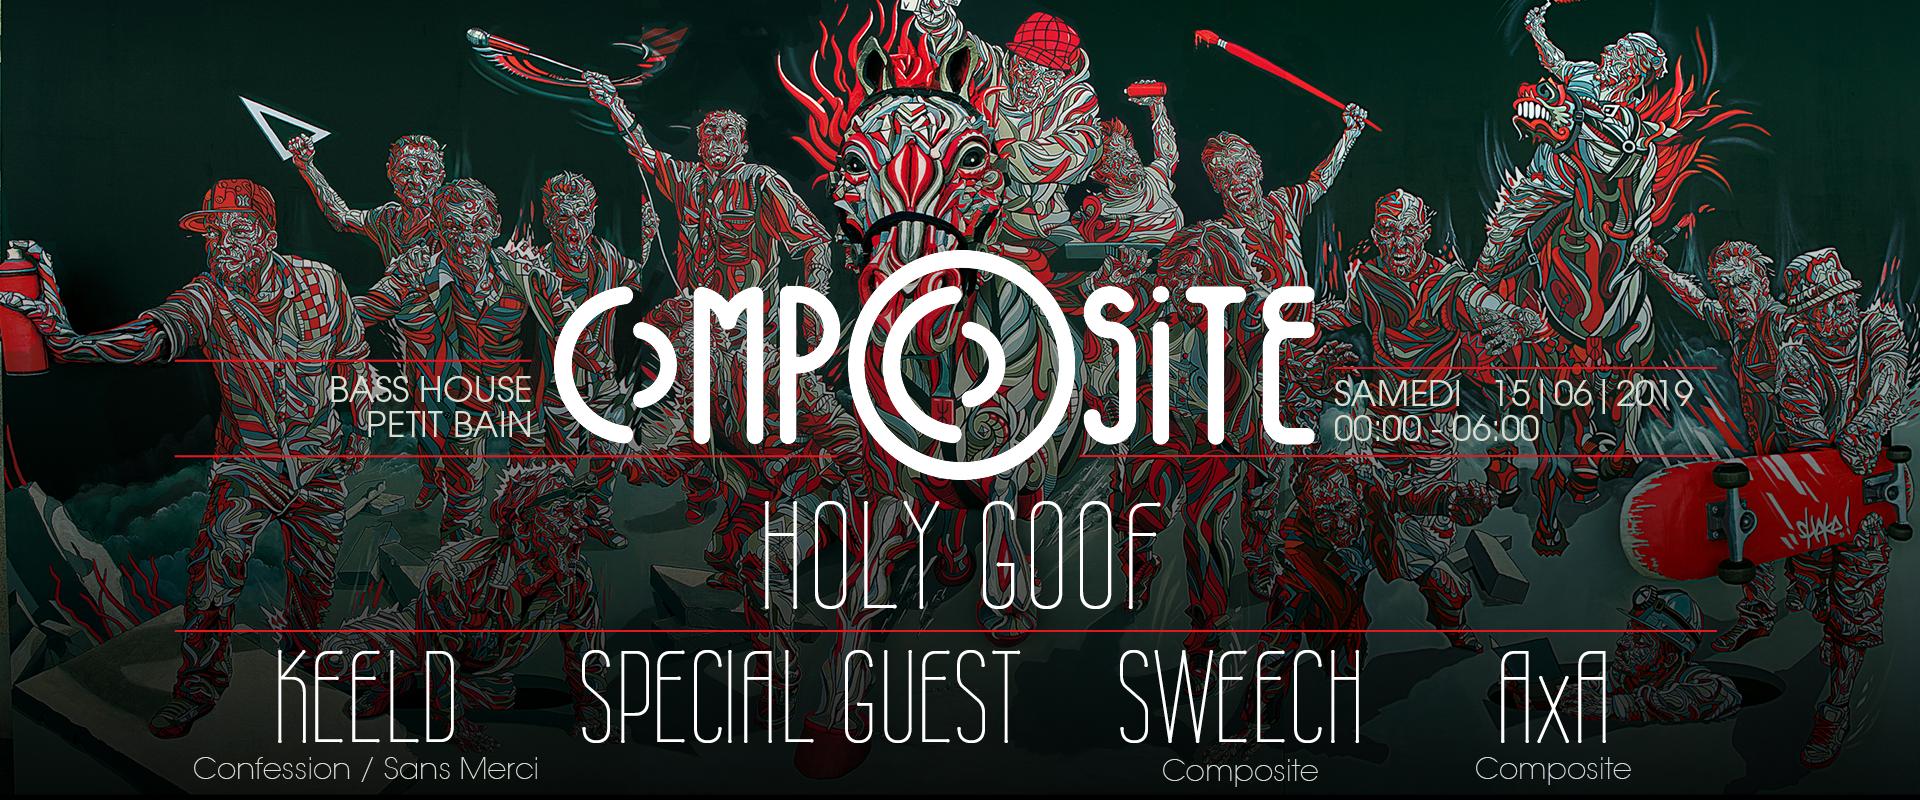 CompOsite w/ Holy Goof / Keeld / Castnowski / Sweech / AxA